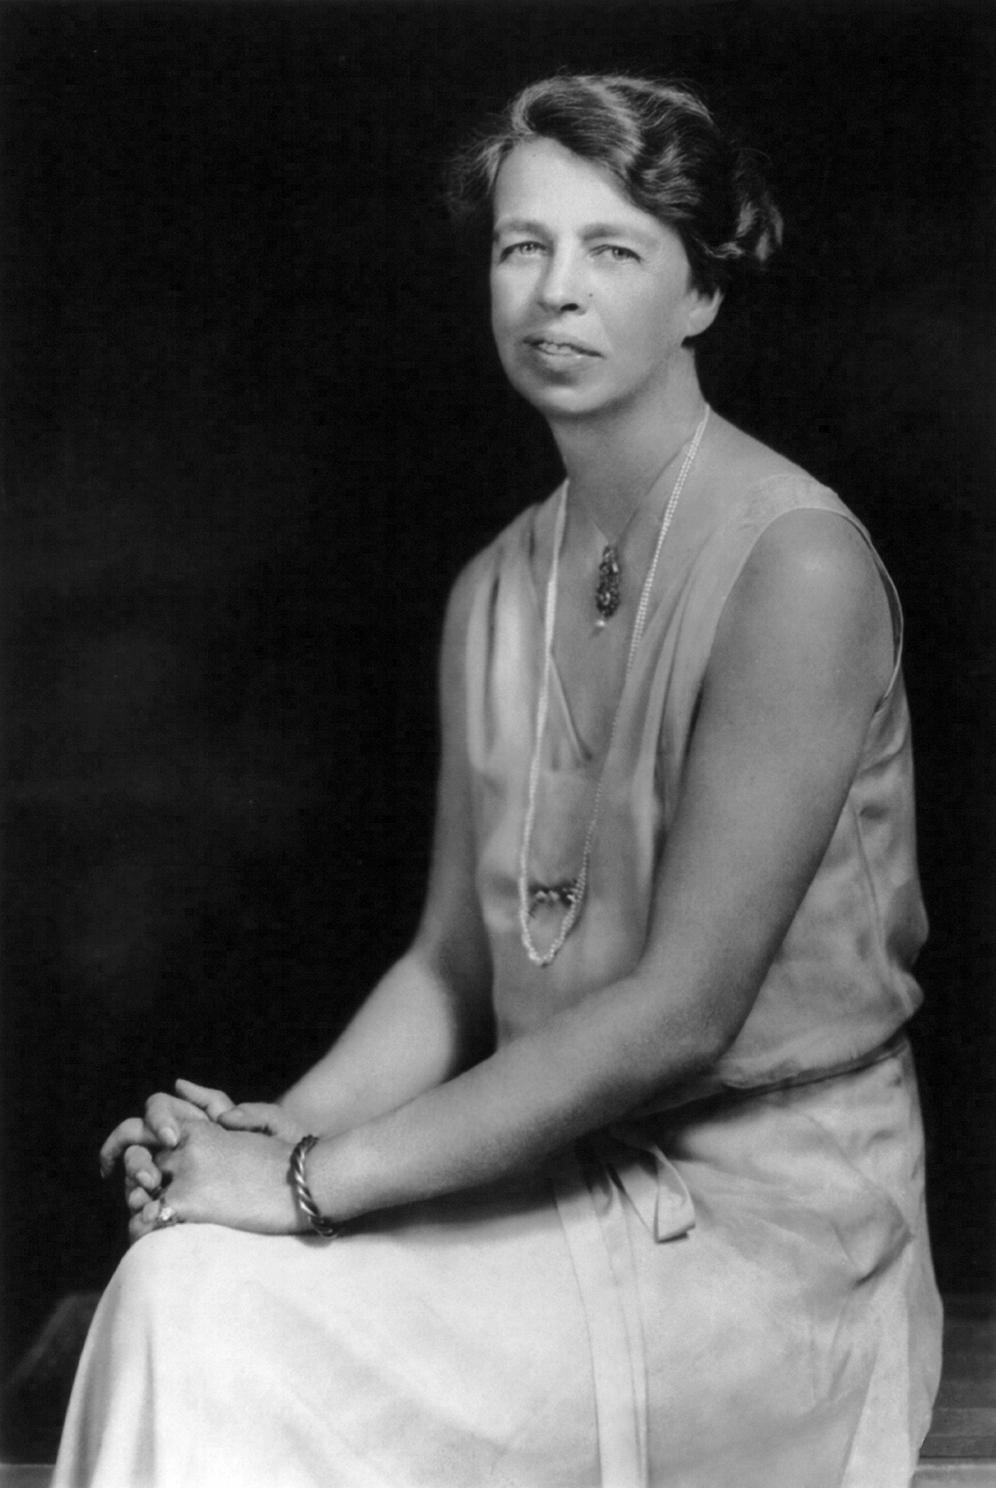 Eleanor Roosevelt cph.3b16000.jpg